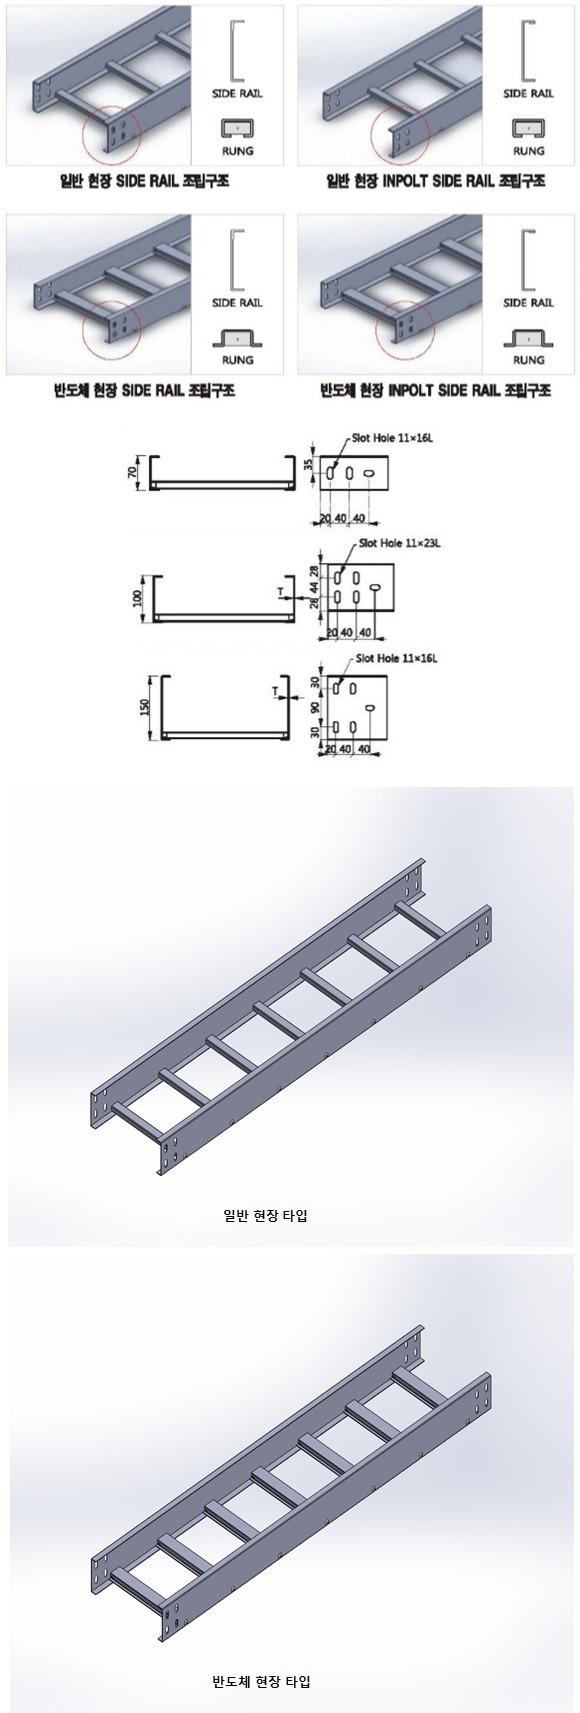 p18_반도체 현장 Infold Side Rail 조립구조 1 .JPG